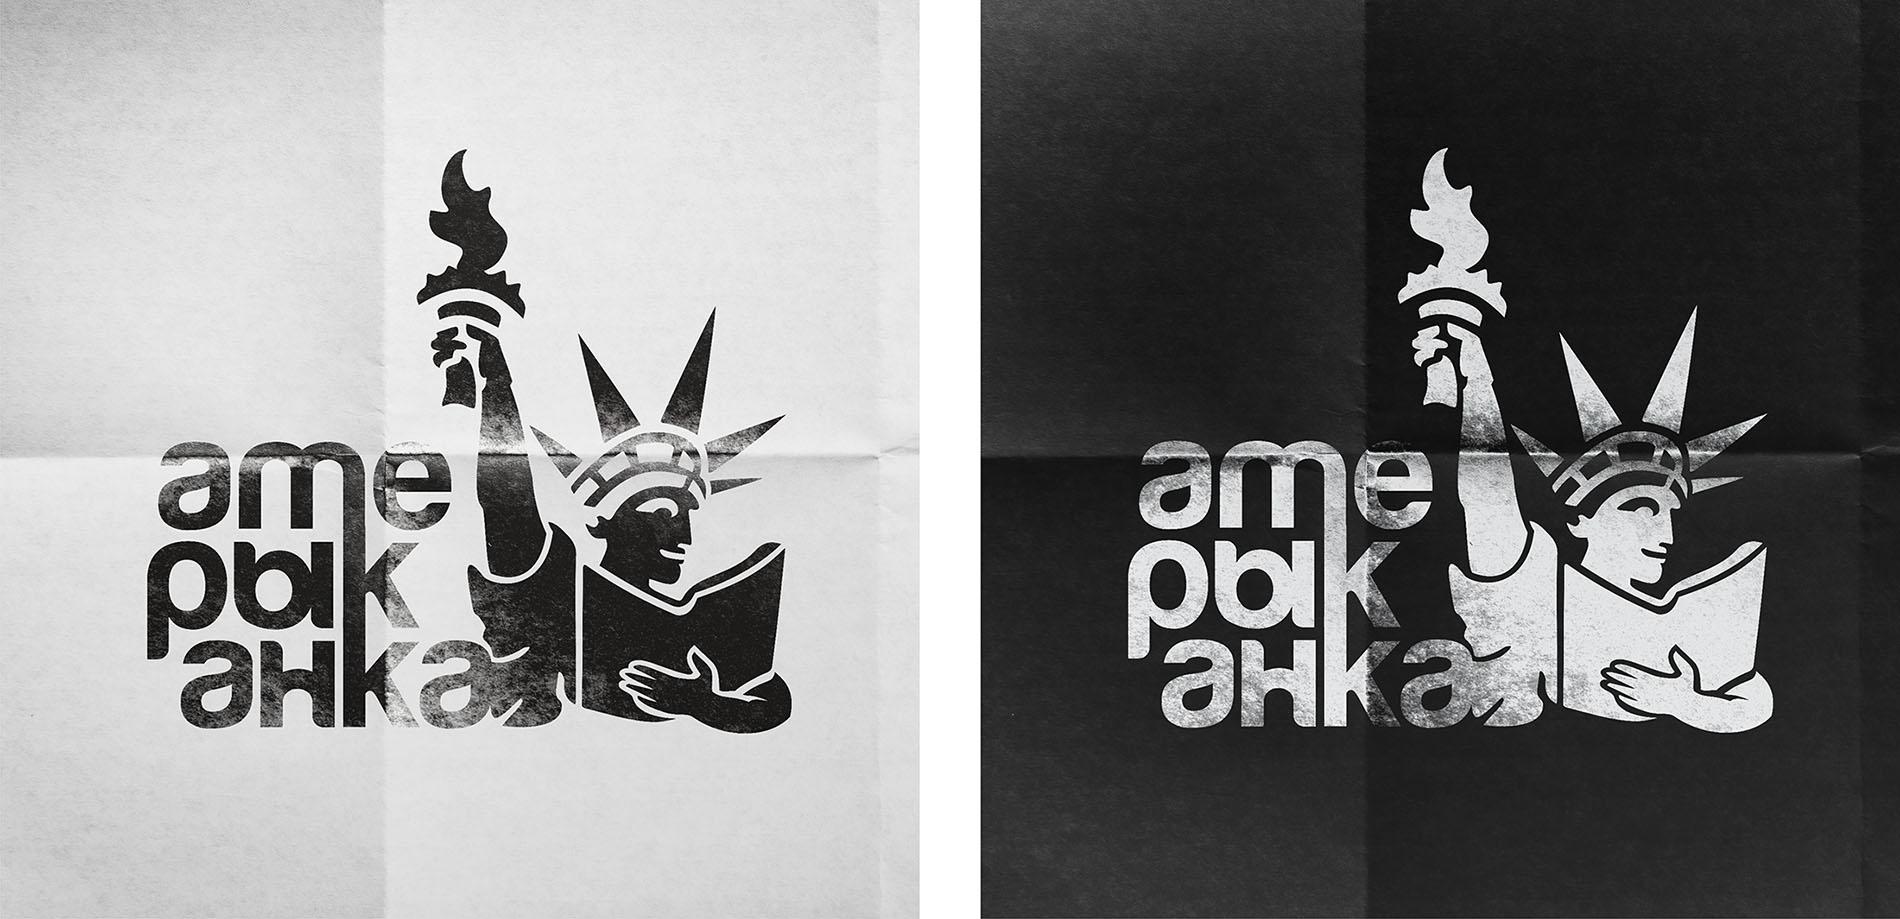 Amerykanka Book Series